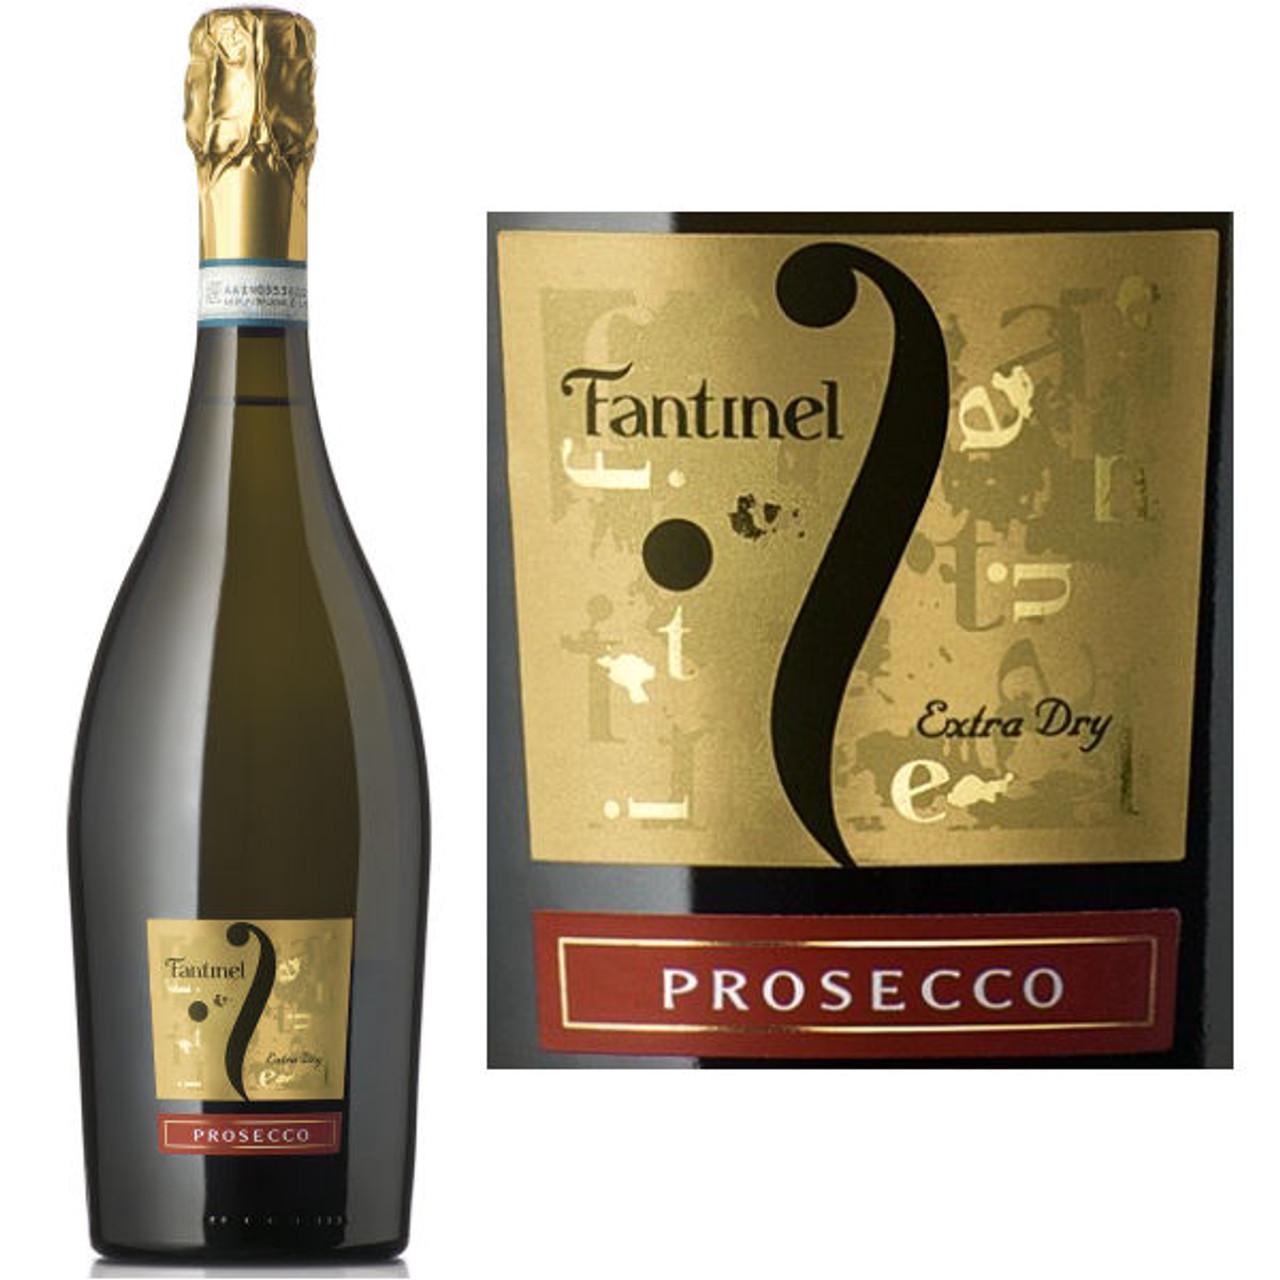 Fantinel Veneto Prosecco Vino Spumante Extra Dry DOC NV